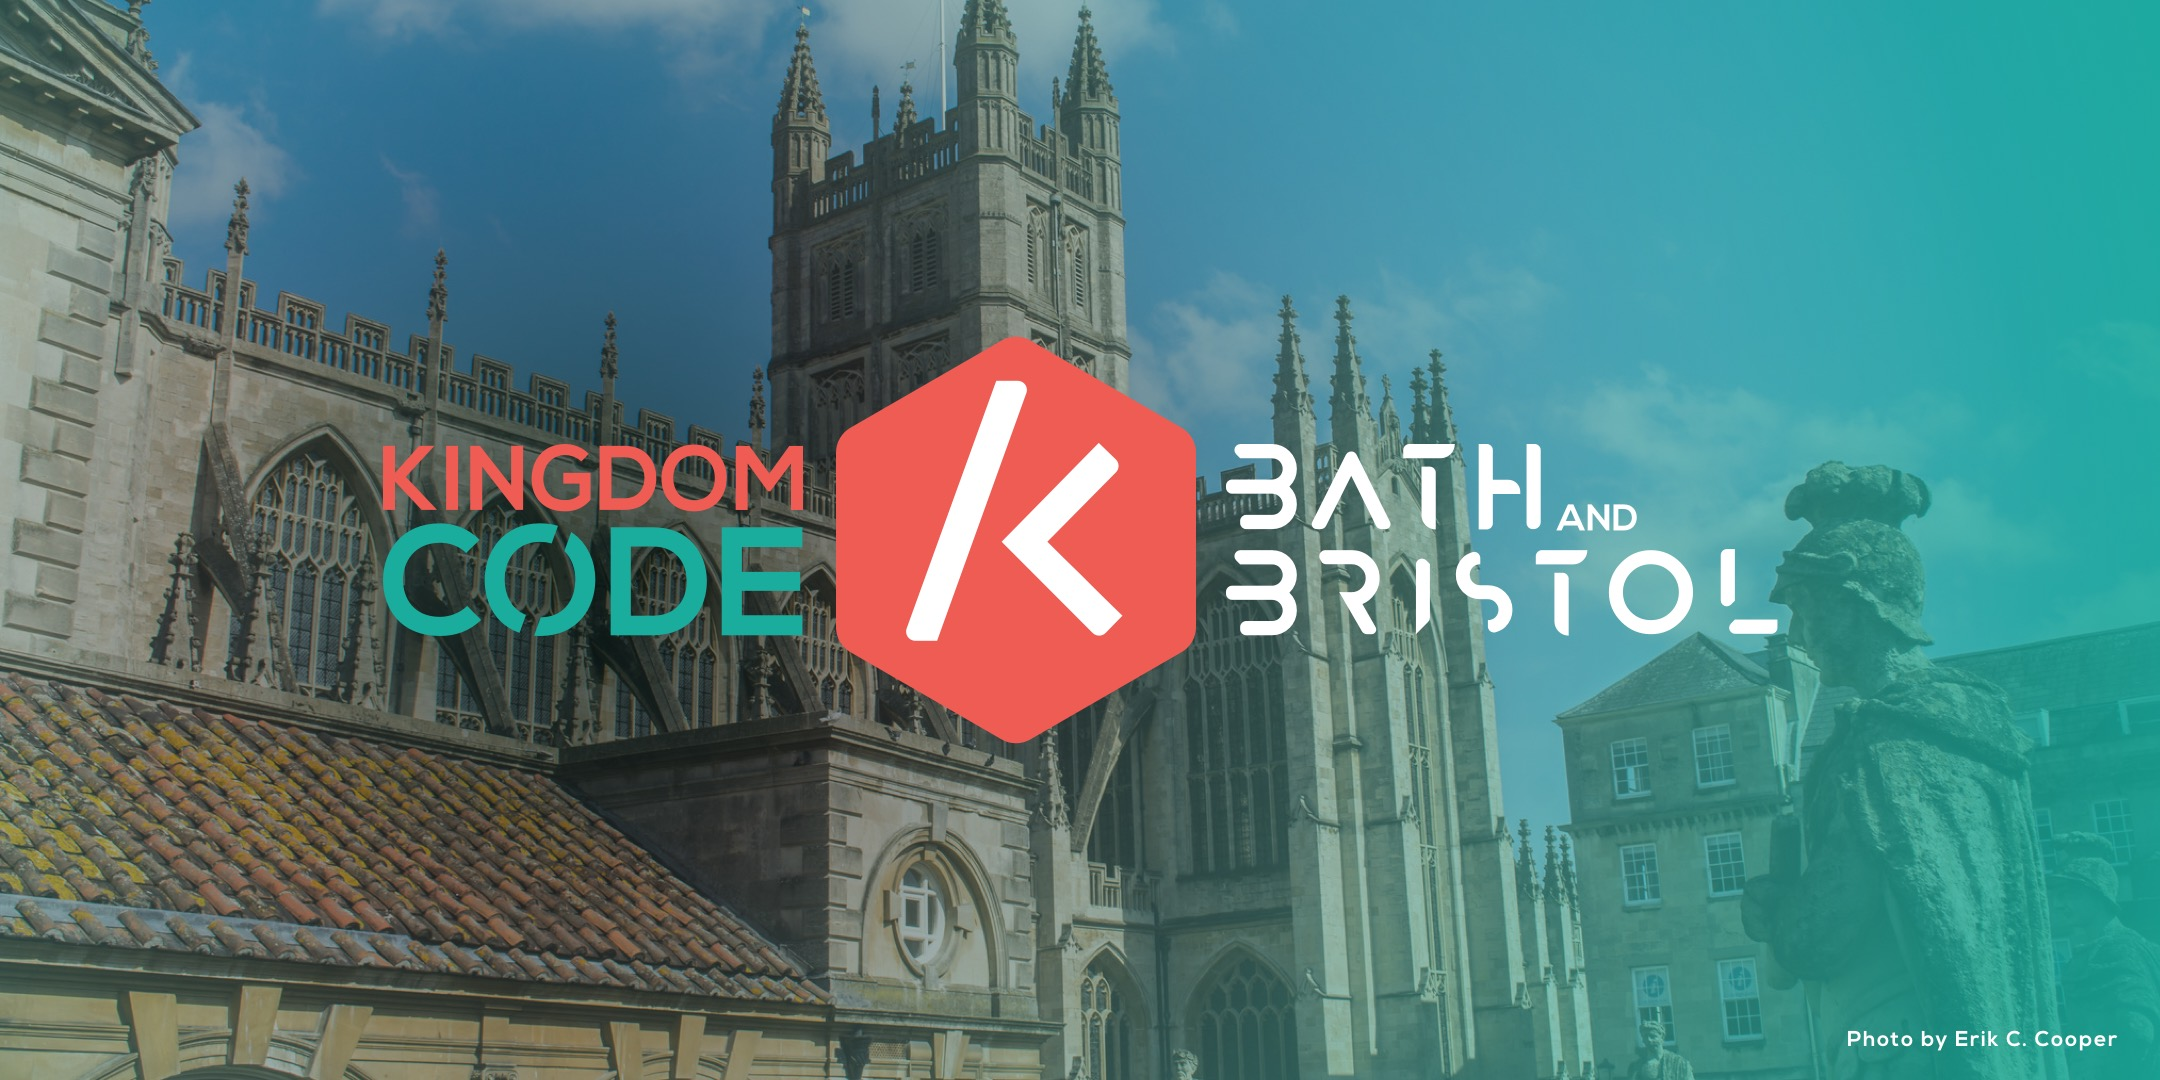 Kingdom Code Bath and Bristol